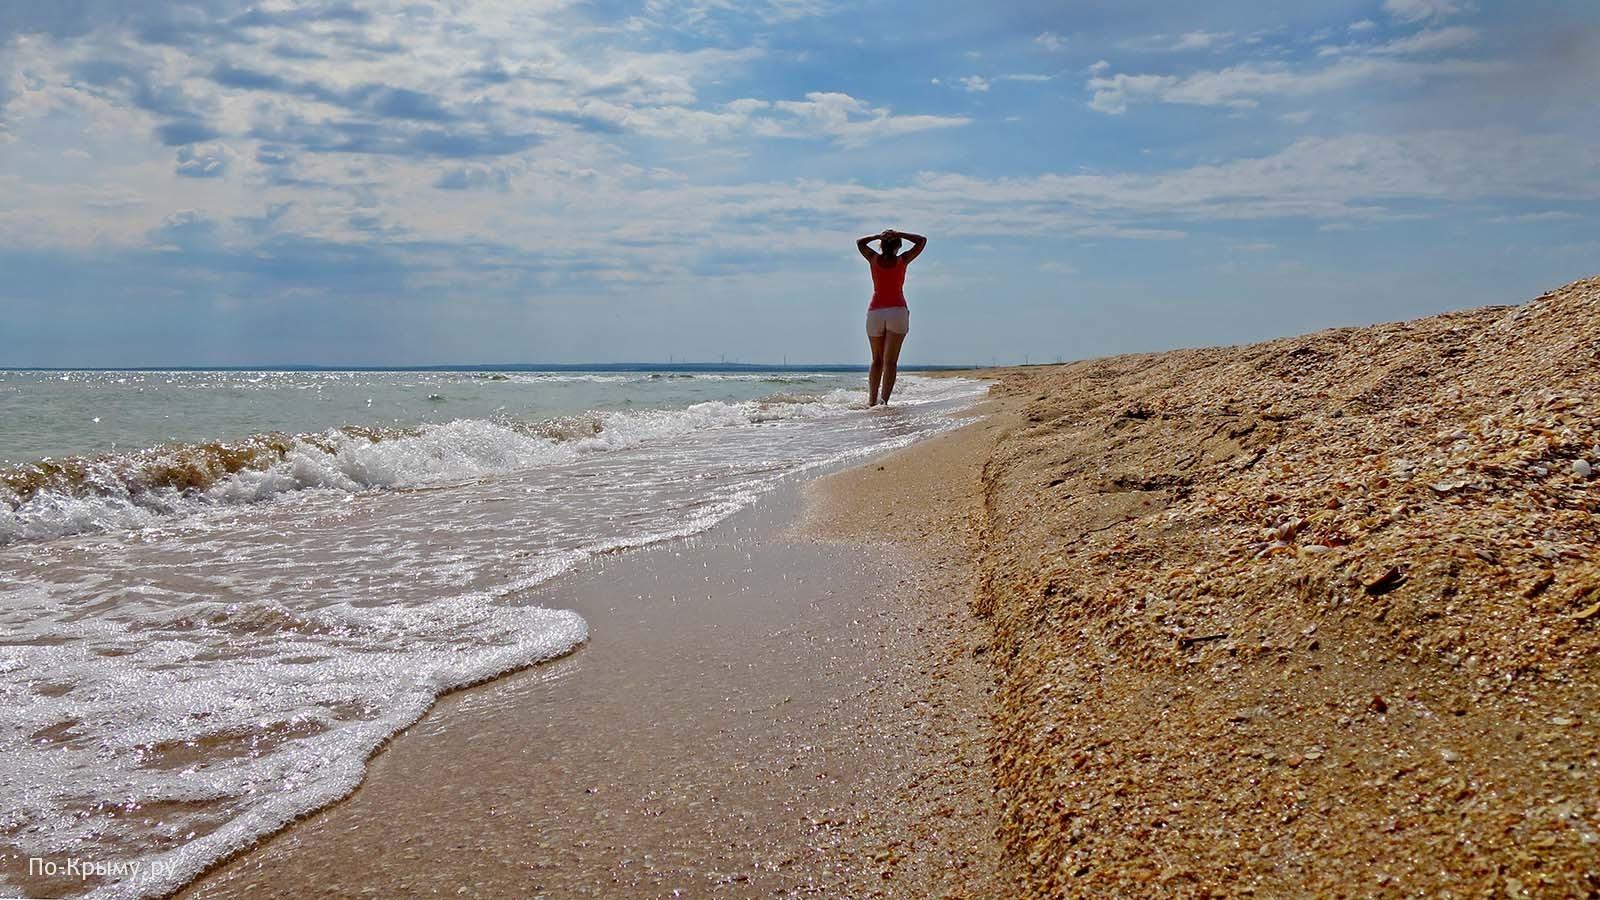 Ракушечный берег Казантипского залива